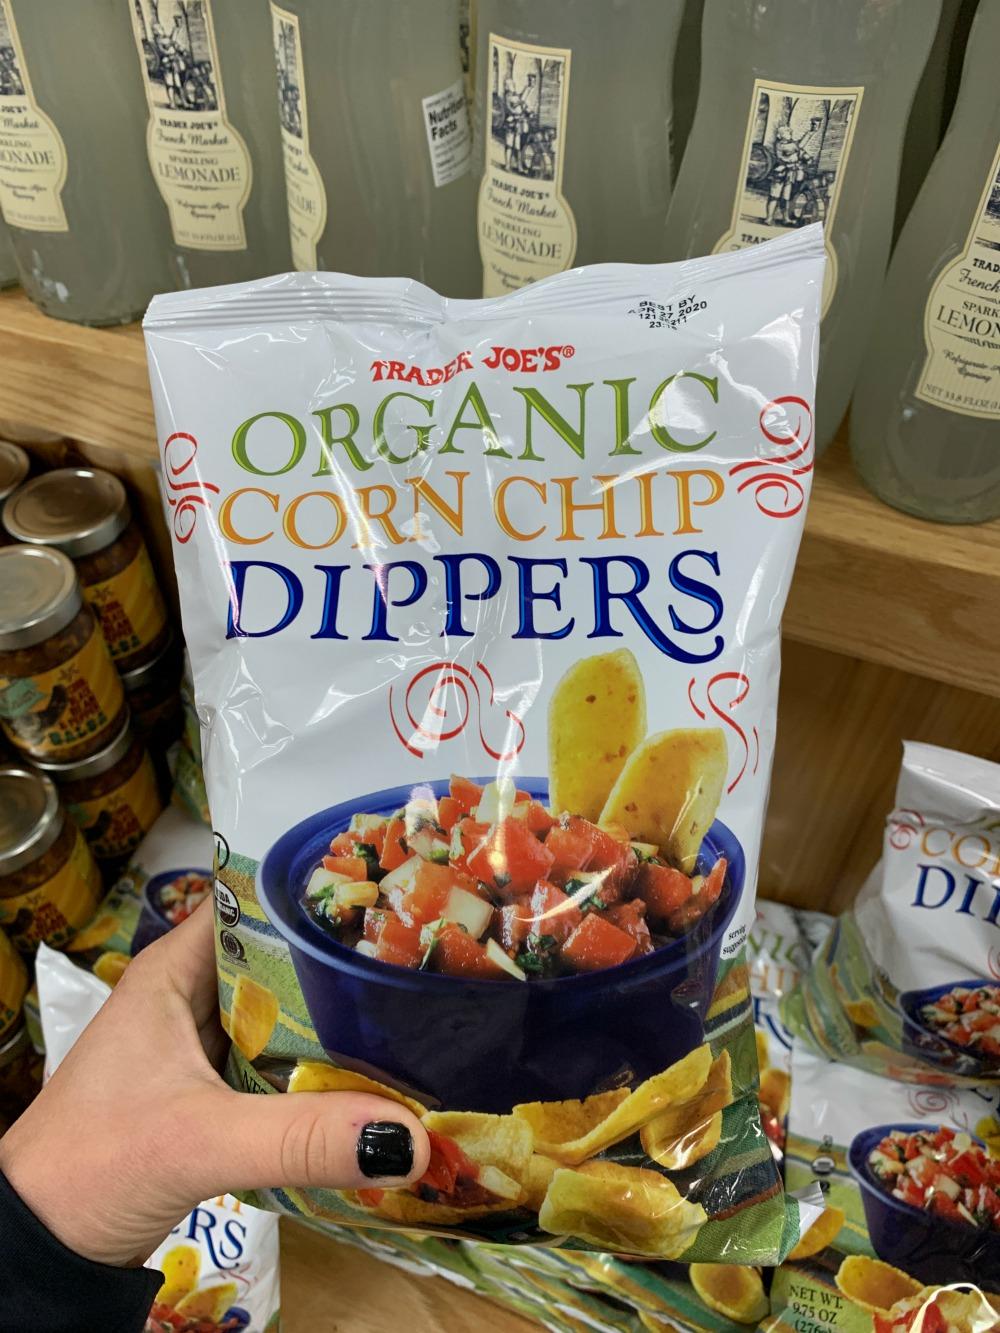 bag of Trader Joe's Organic Corn Chip Dippers